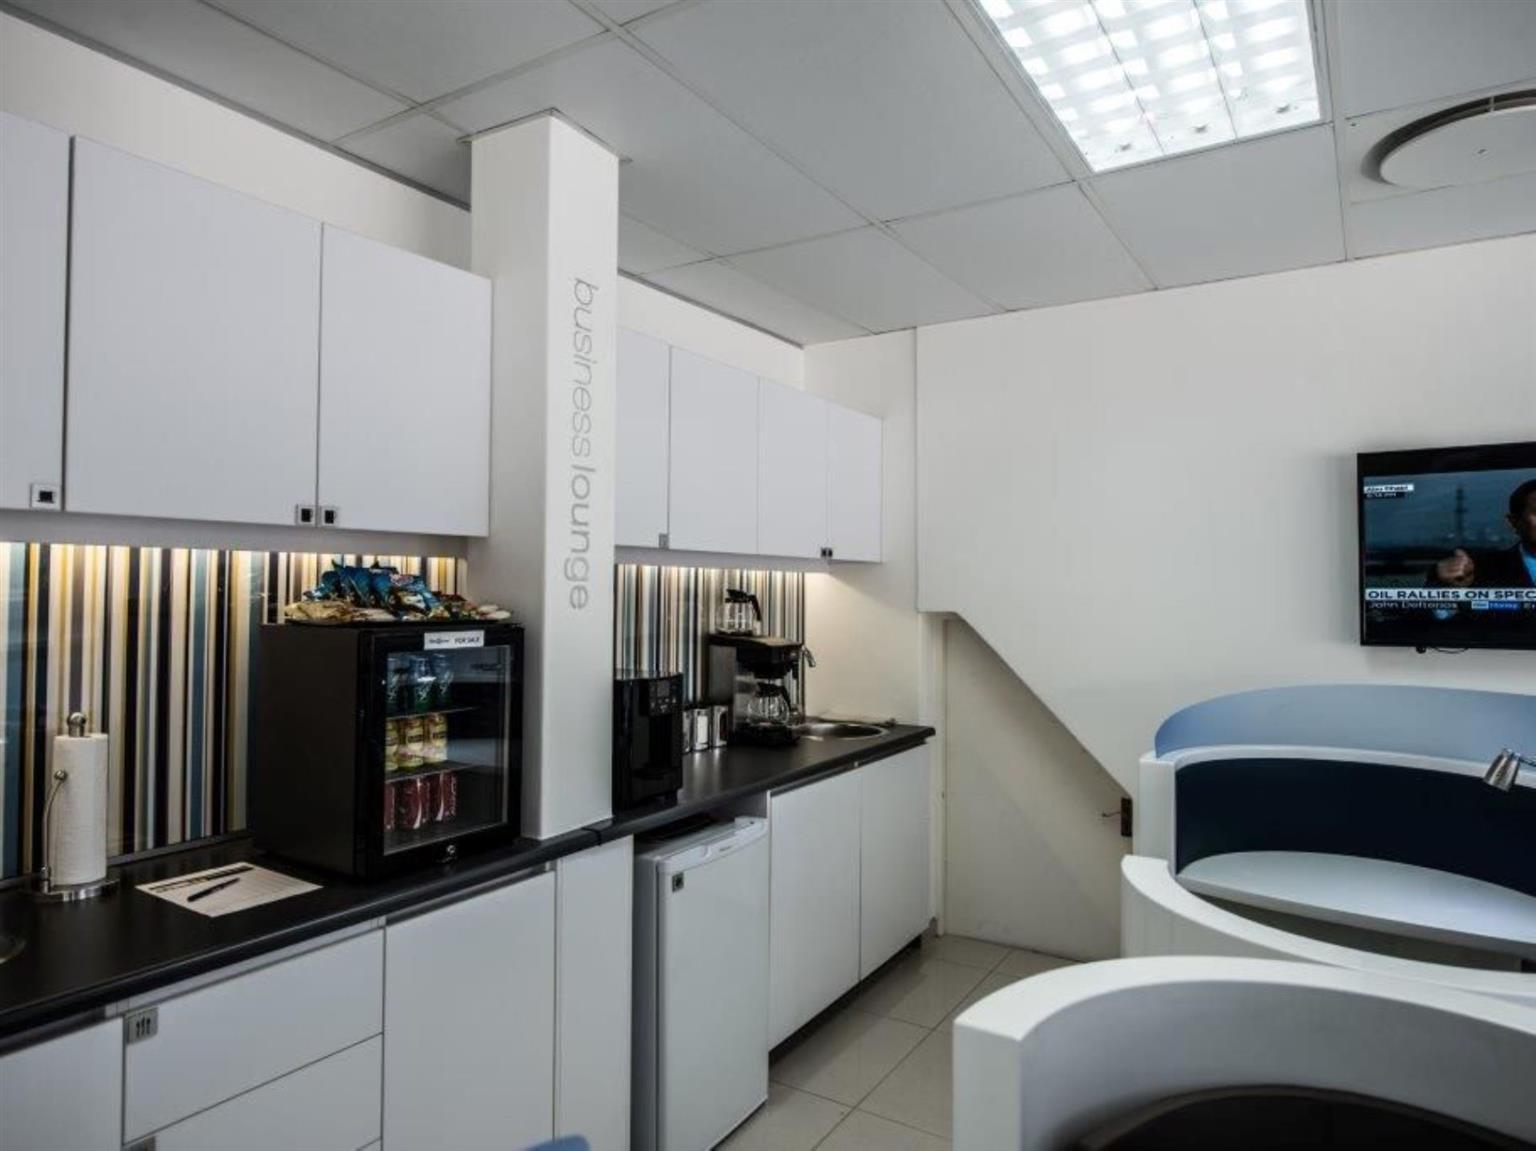 Office Rental Monthly in PIETERMARITZBURG